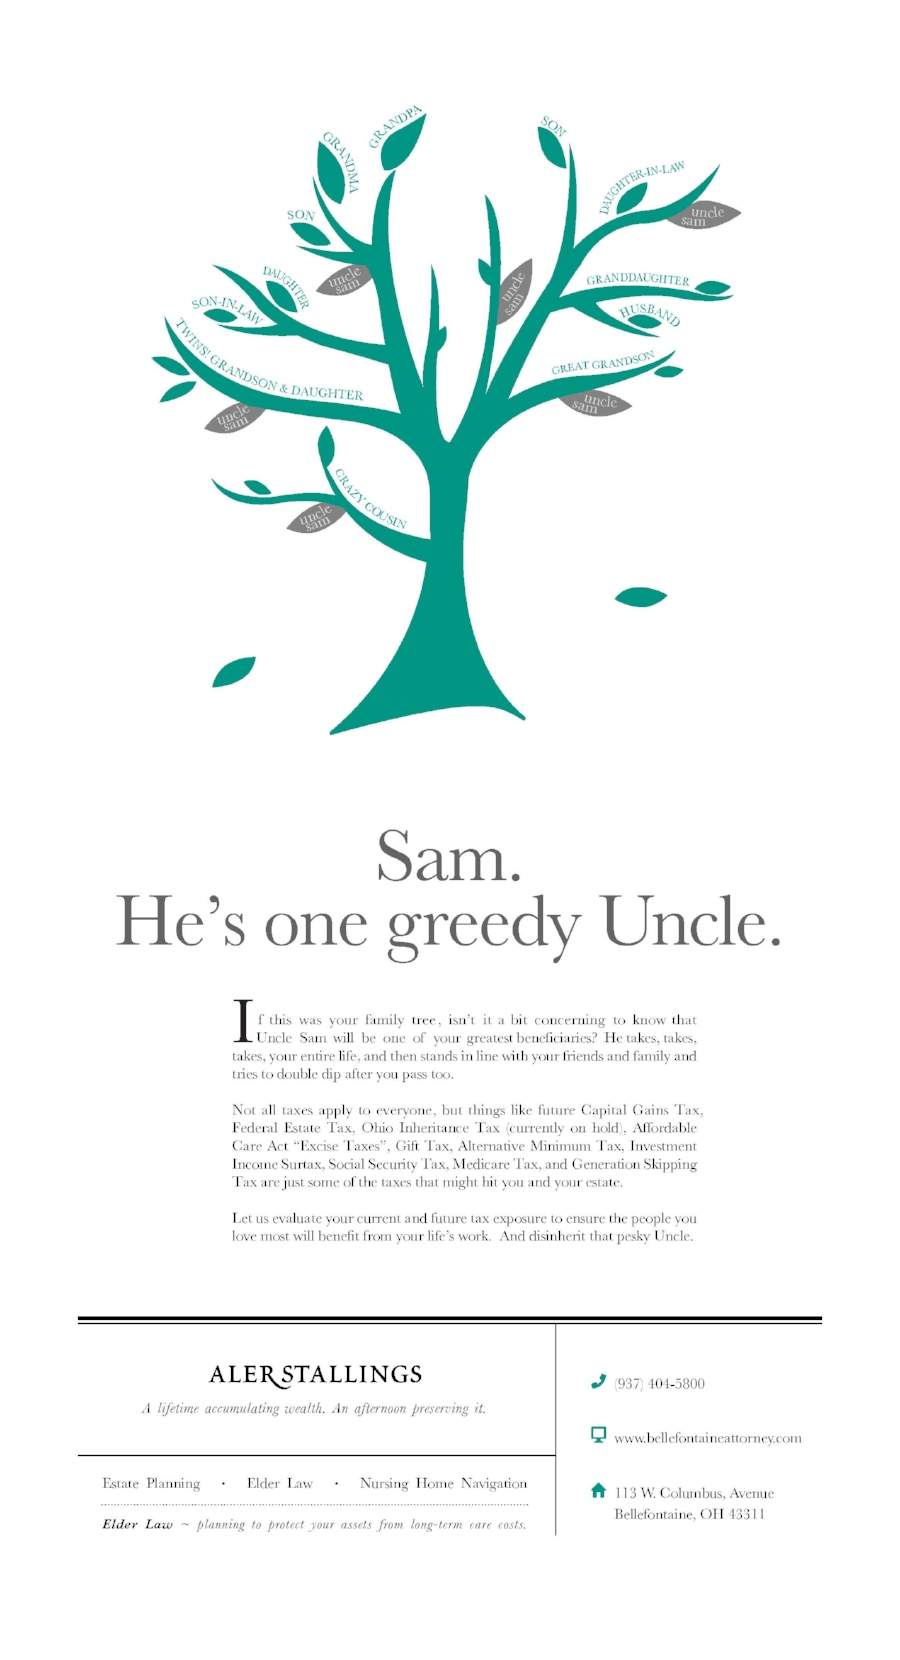 Uncle Sam Ad.jpg